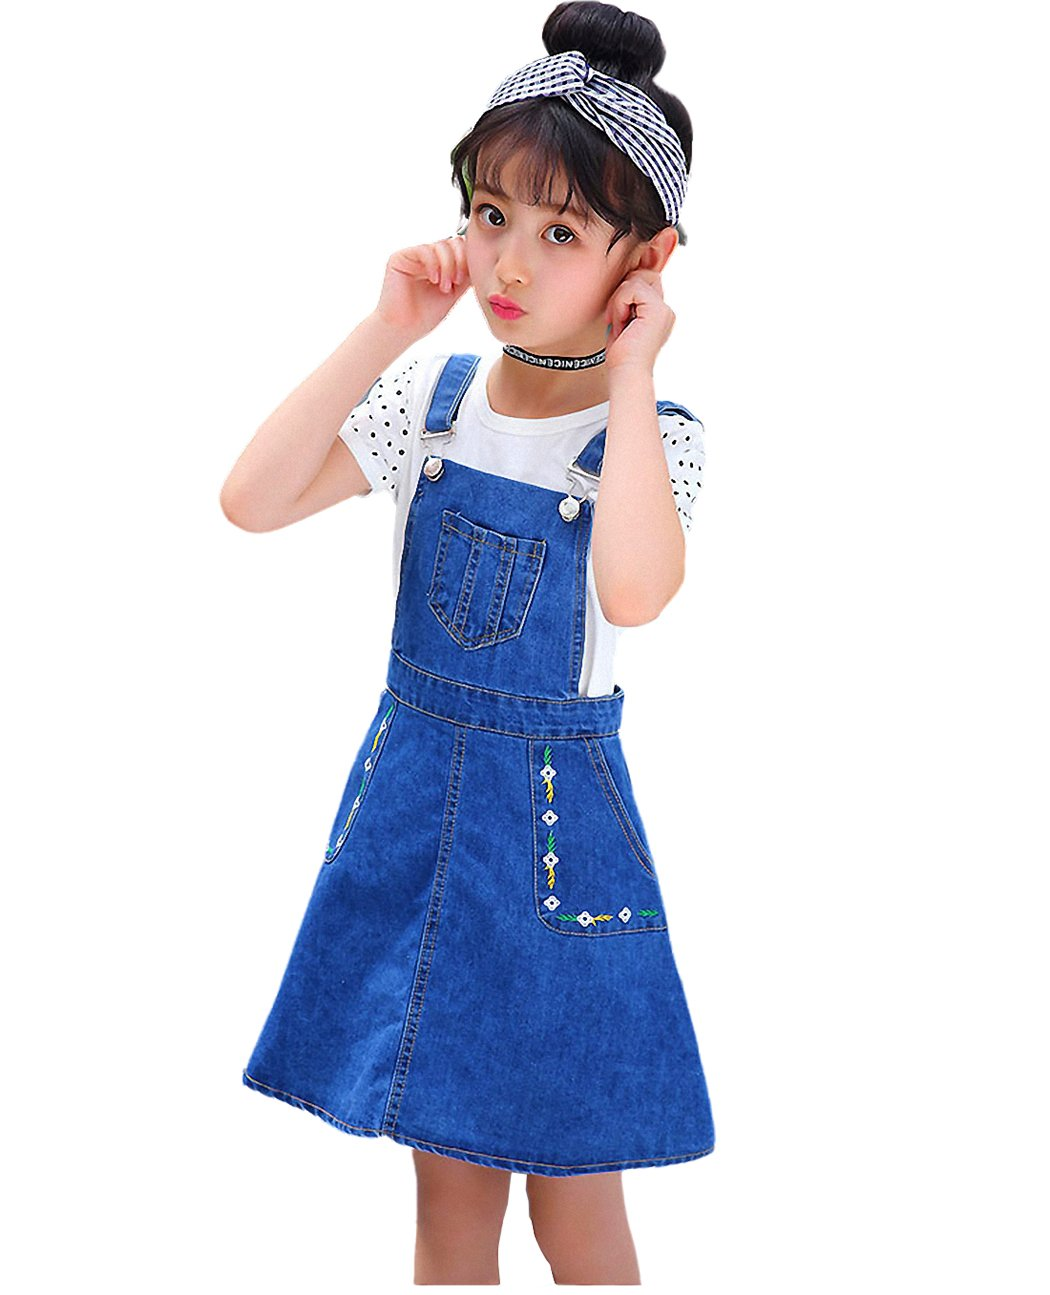 Kidscool Girls Big Bibs Small Flowers Decor Summer Jeans Overalls Dress,Blue,10-11 Years